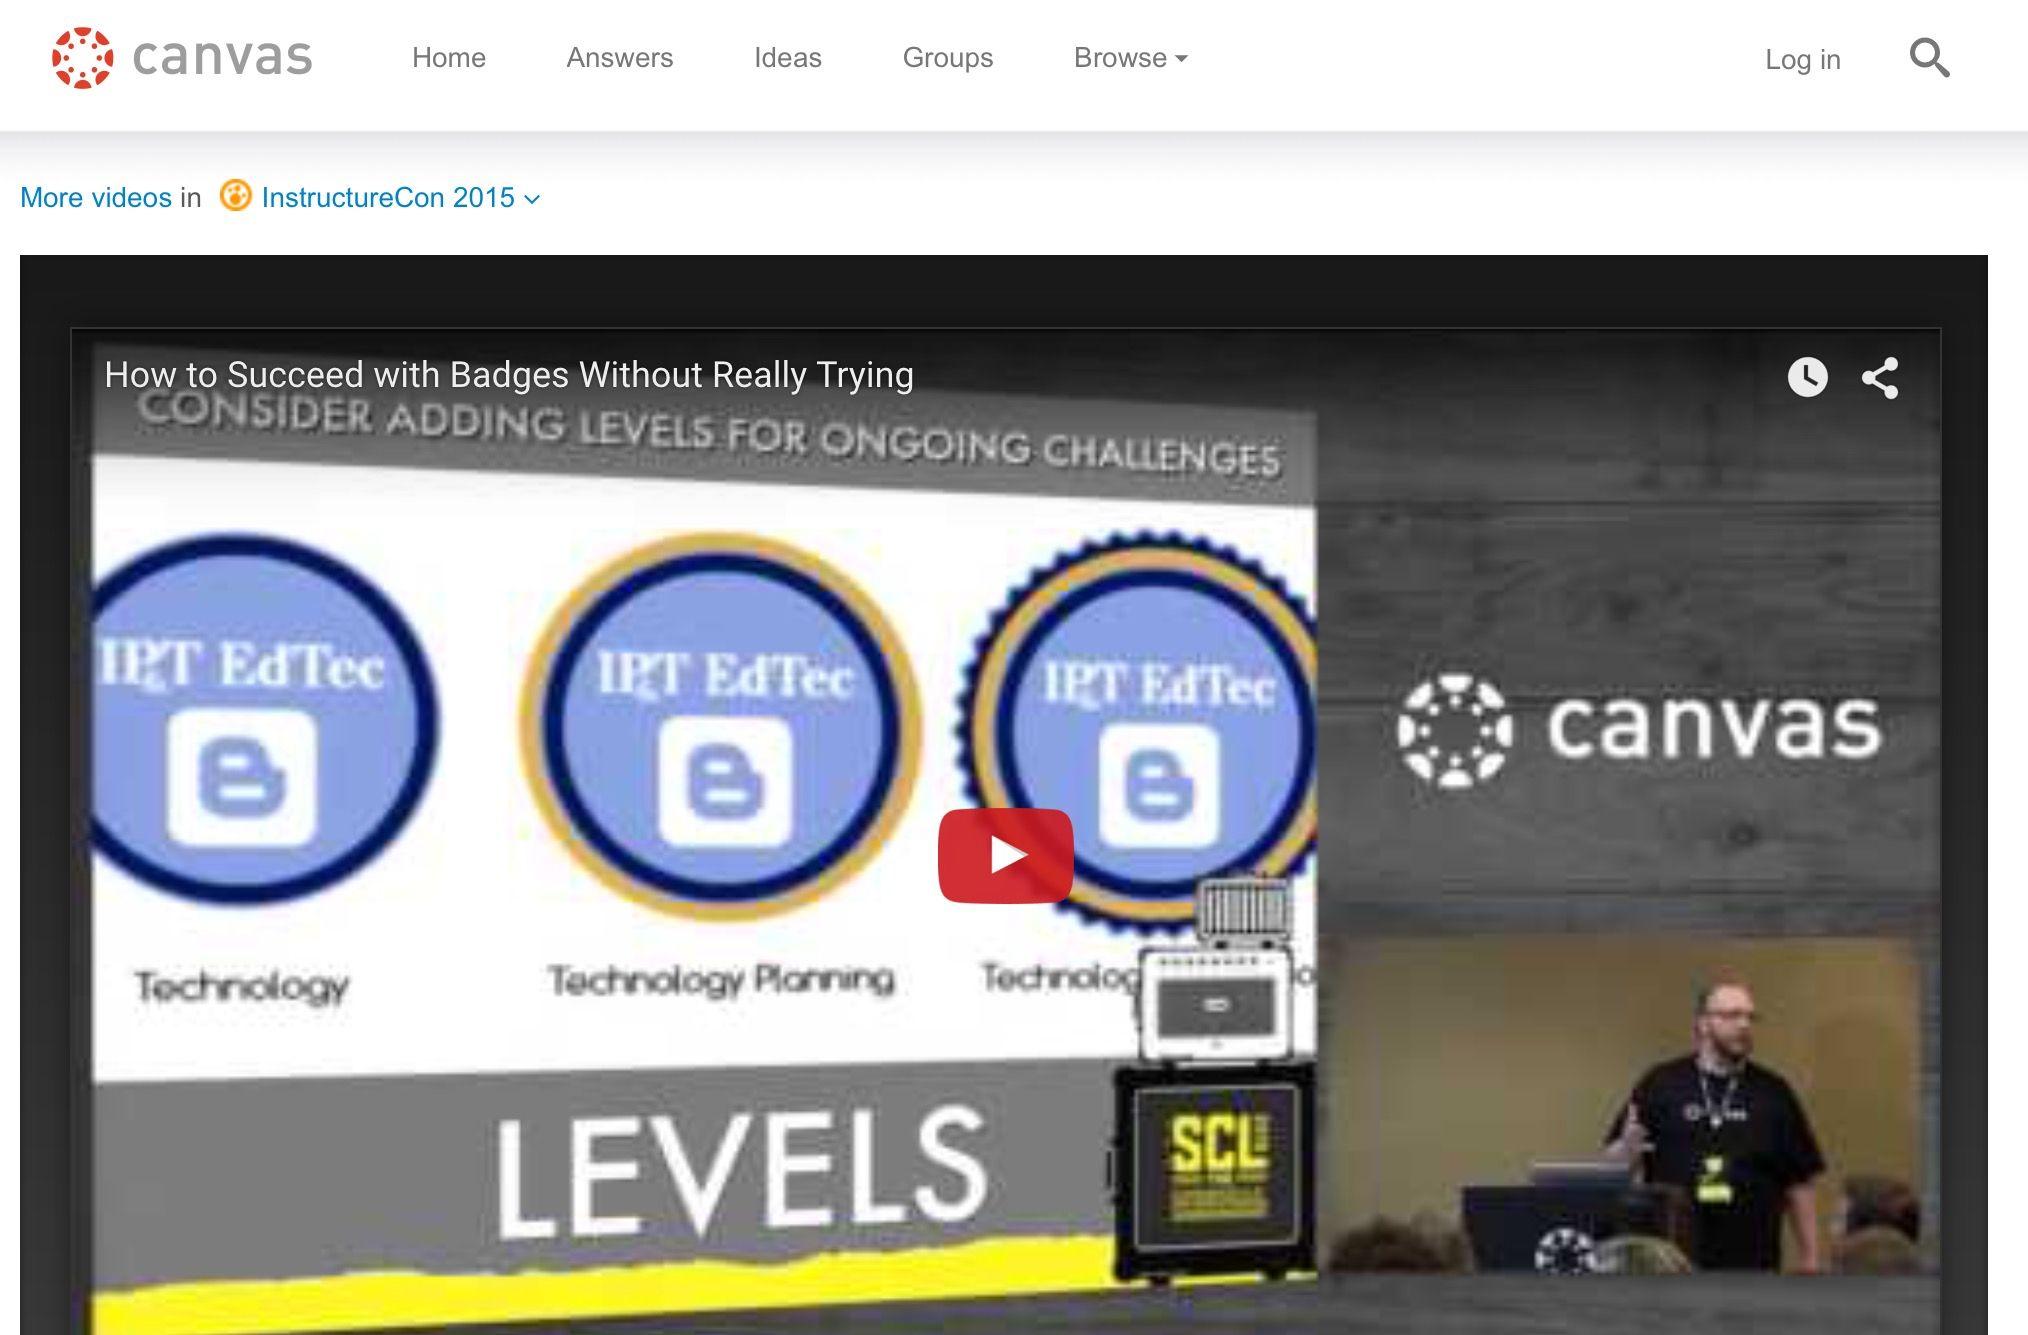 Digital Badges for Learning